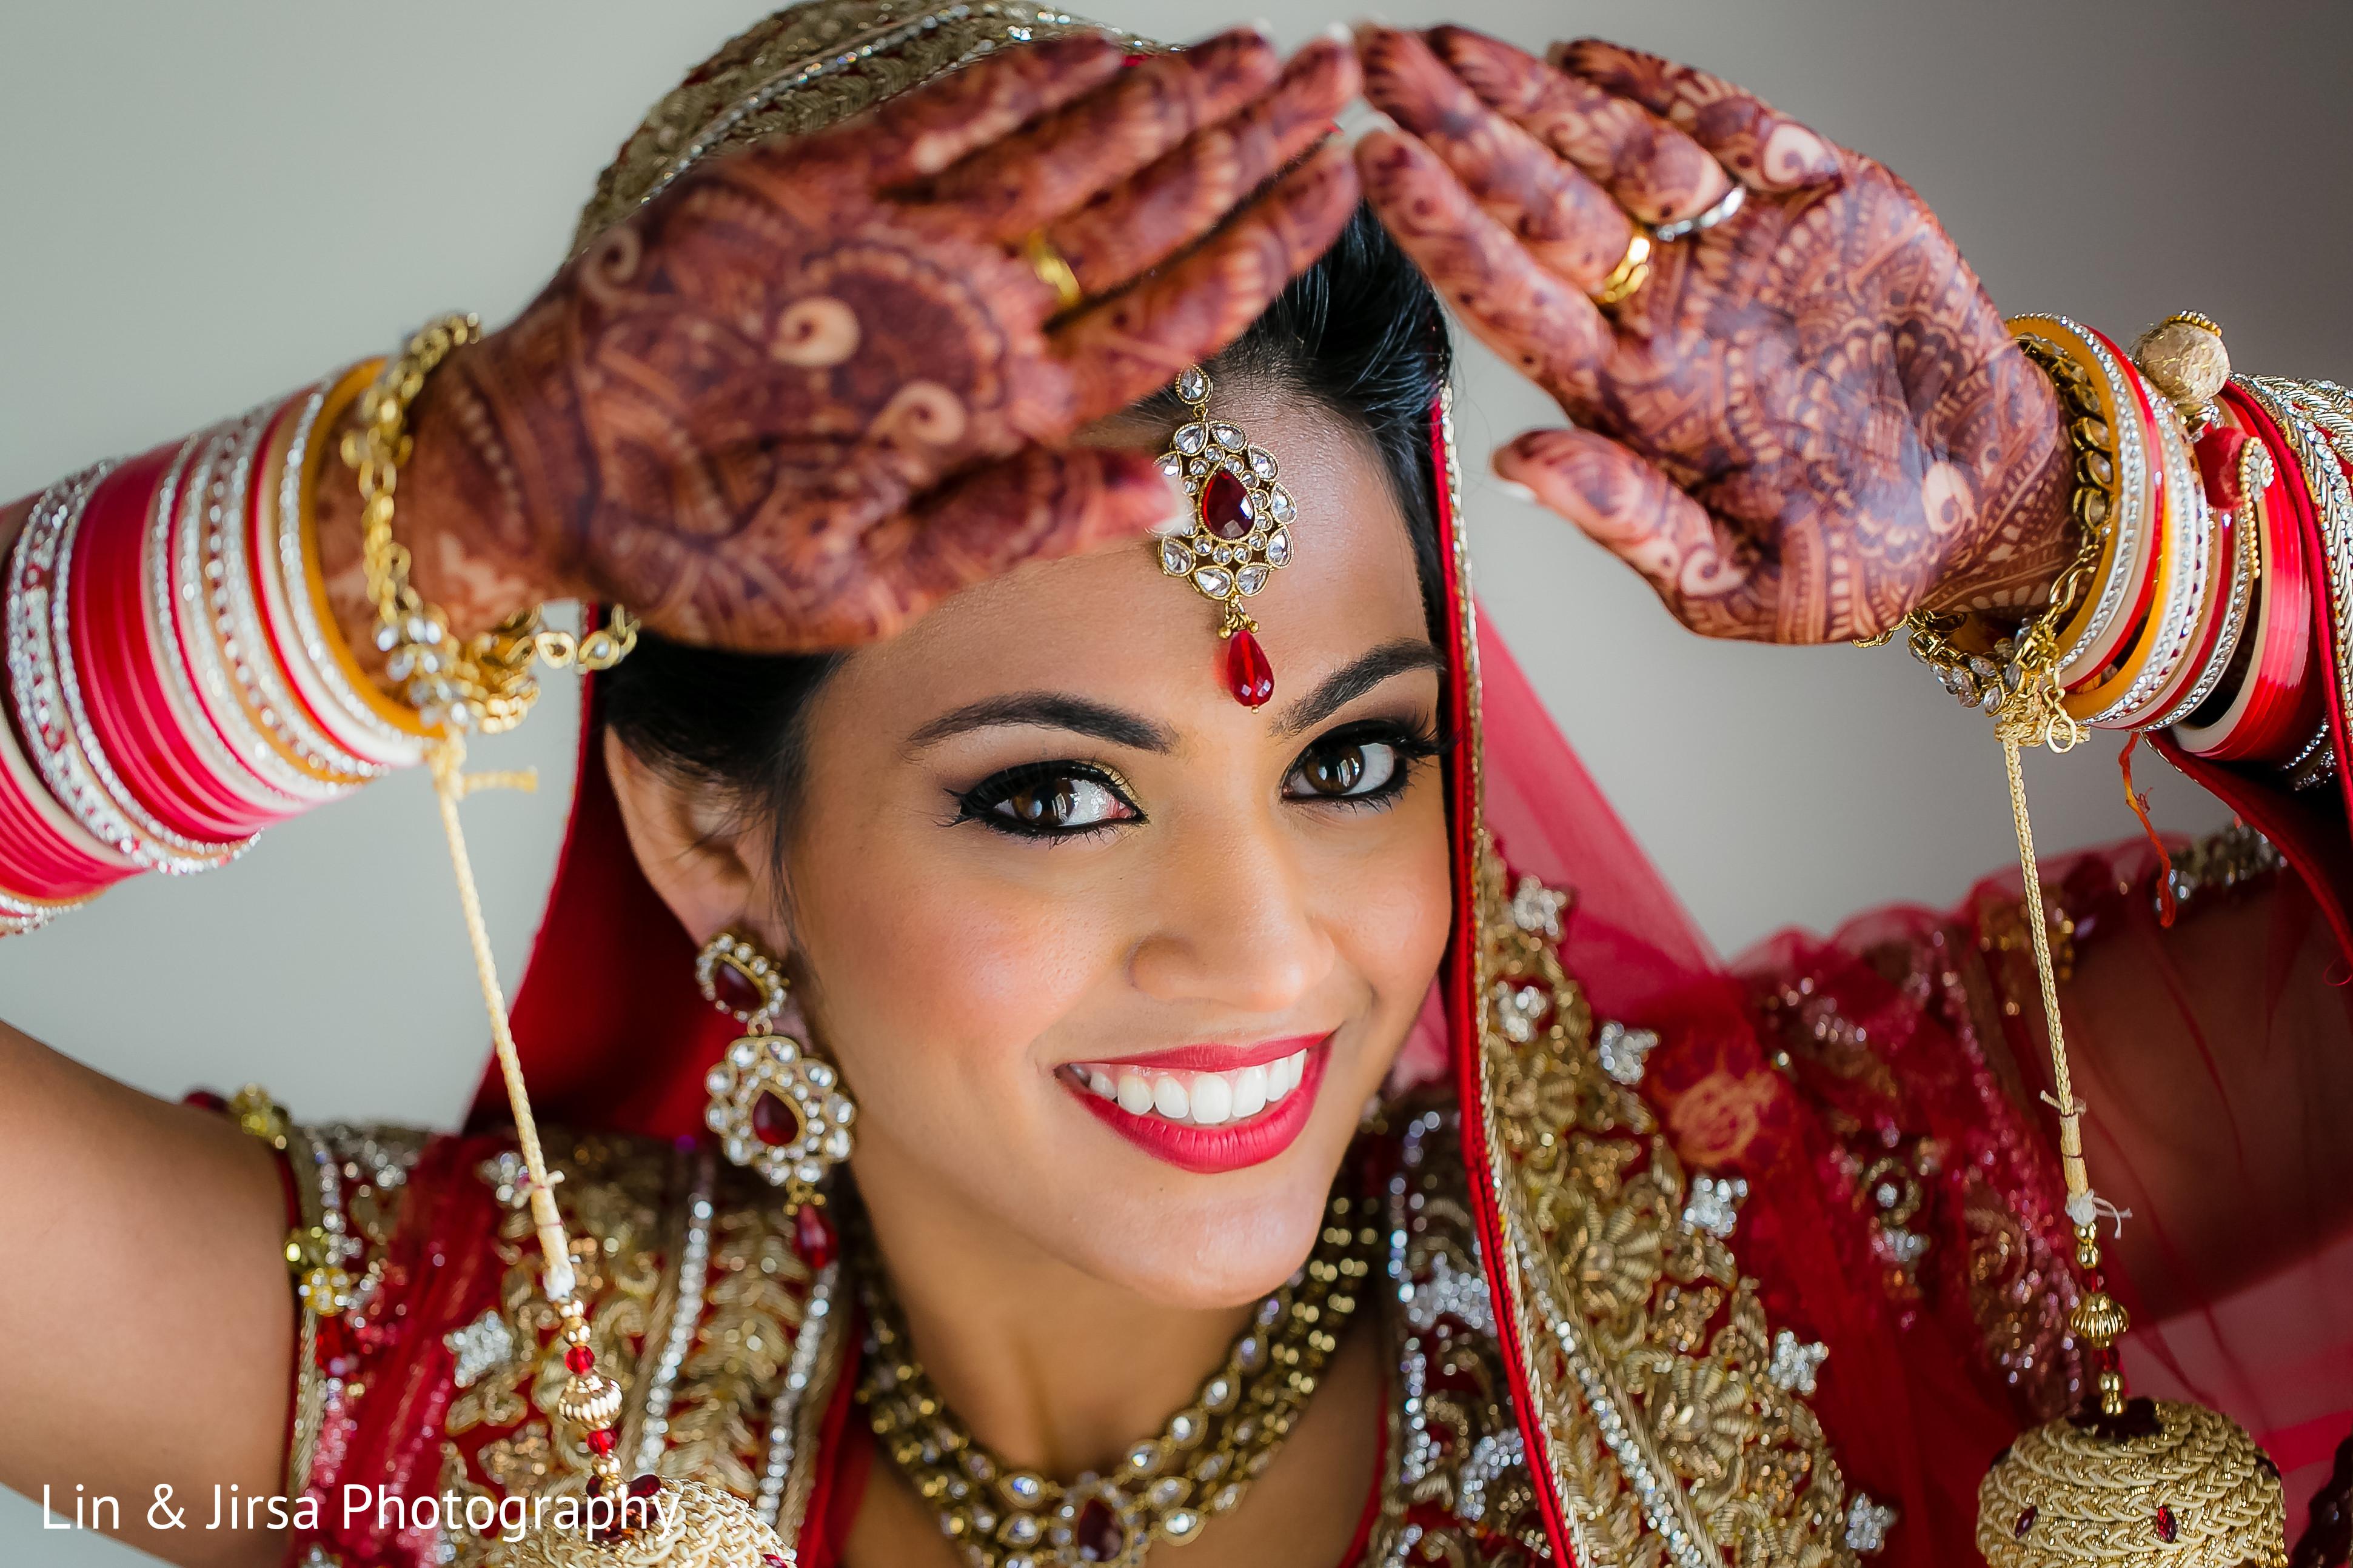 Mehndi Bridal Photoshoot : Bridal portrait in dana point ca indian wedding by lin jirsa